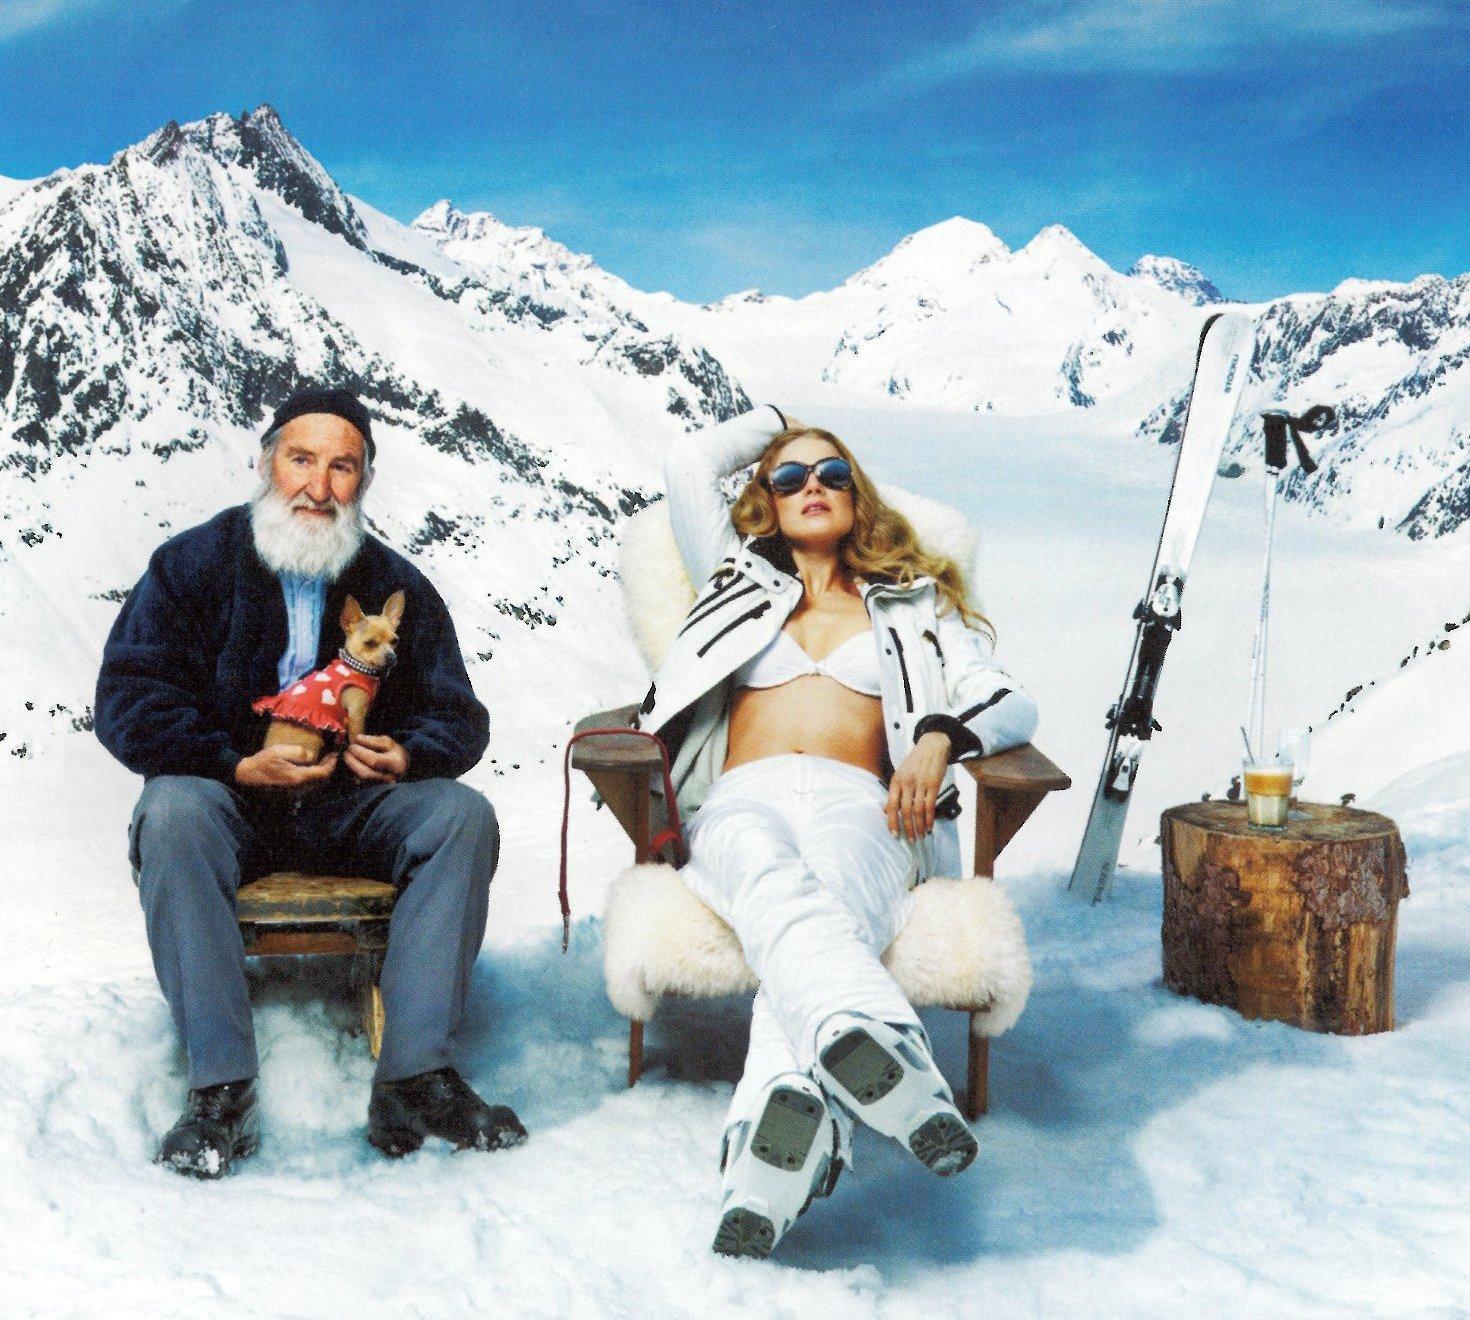 www.alpinewinterblog